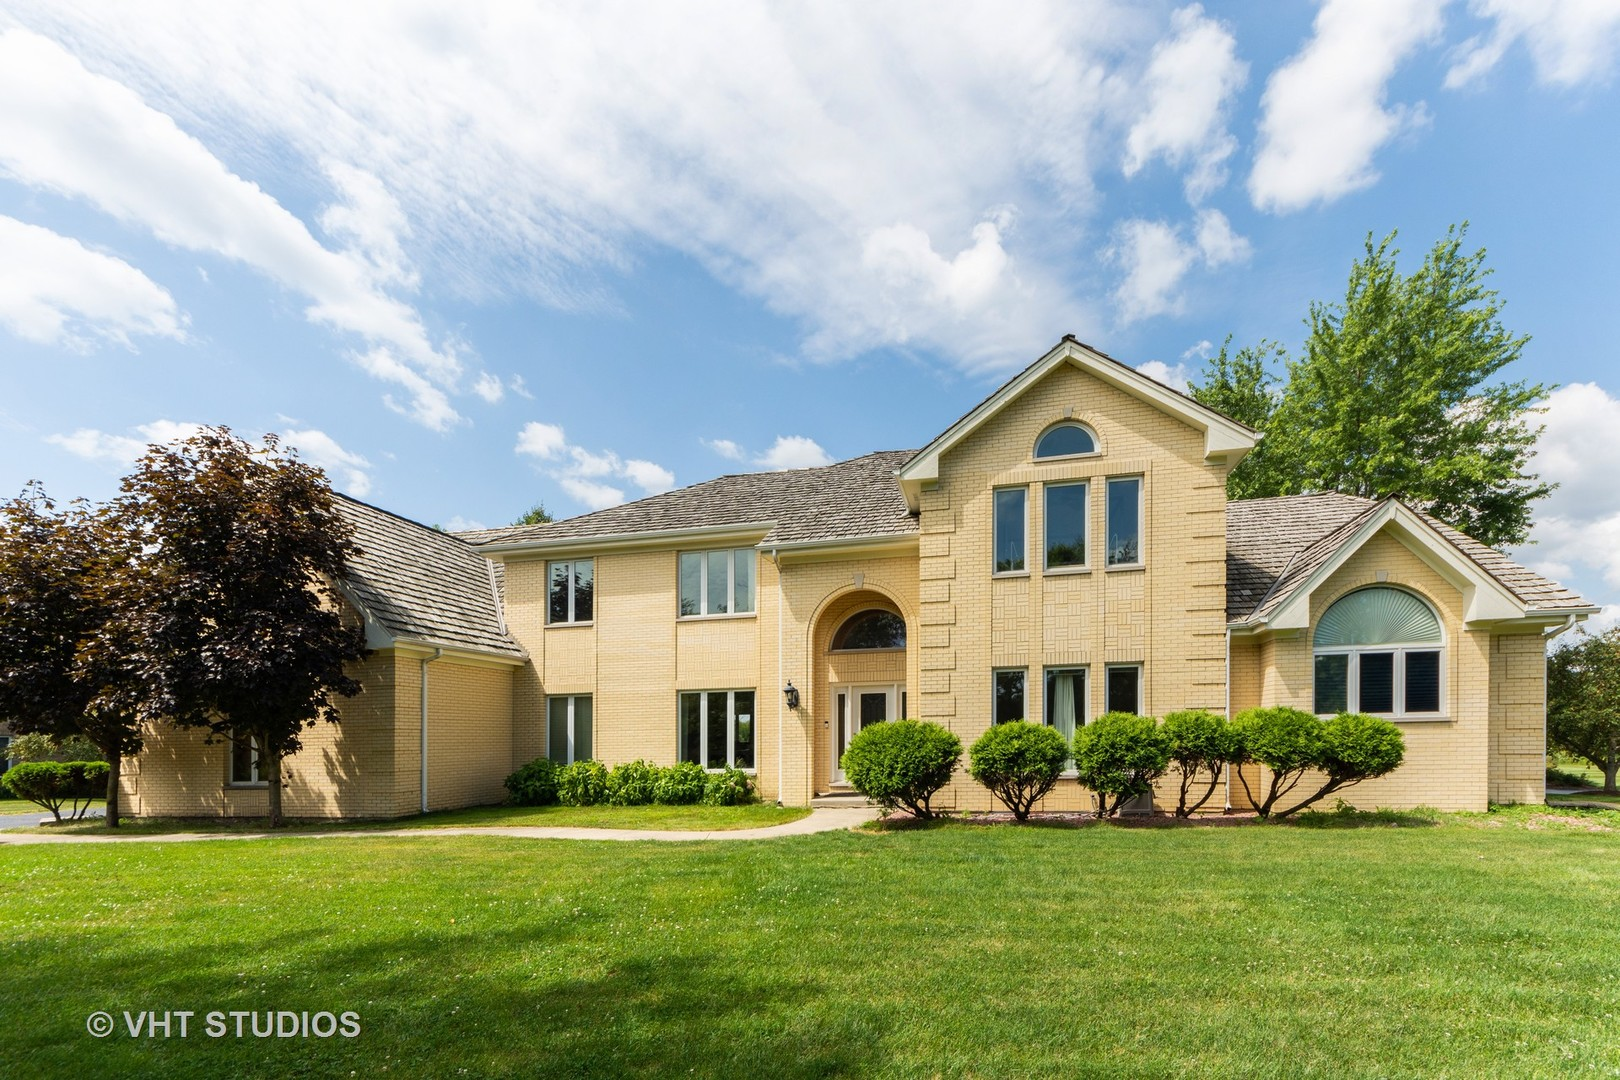 3821 Nottingham ,Long Grove, Illinois 60047